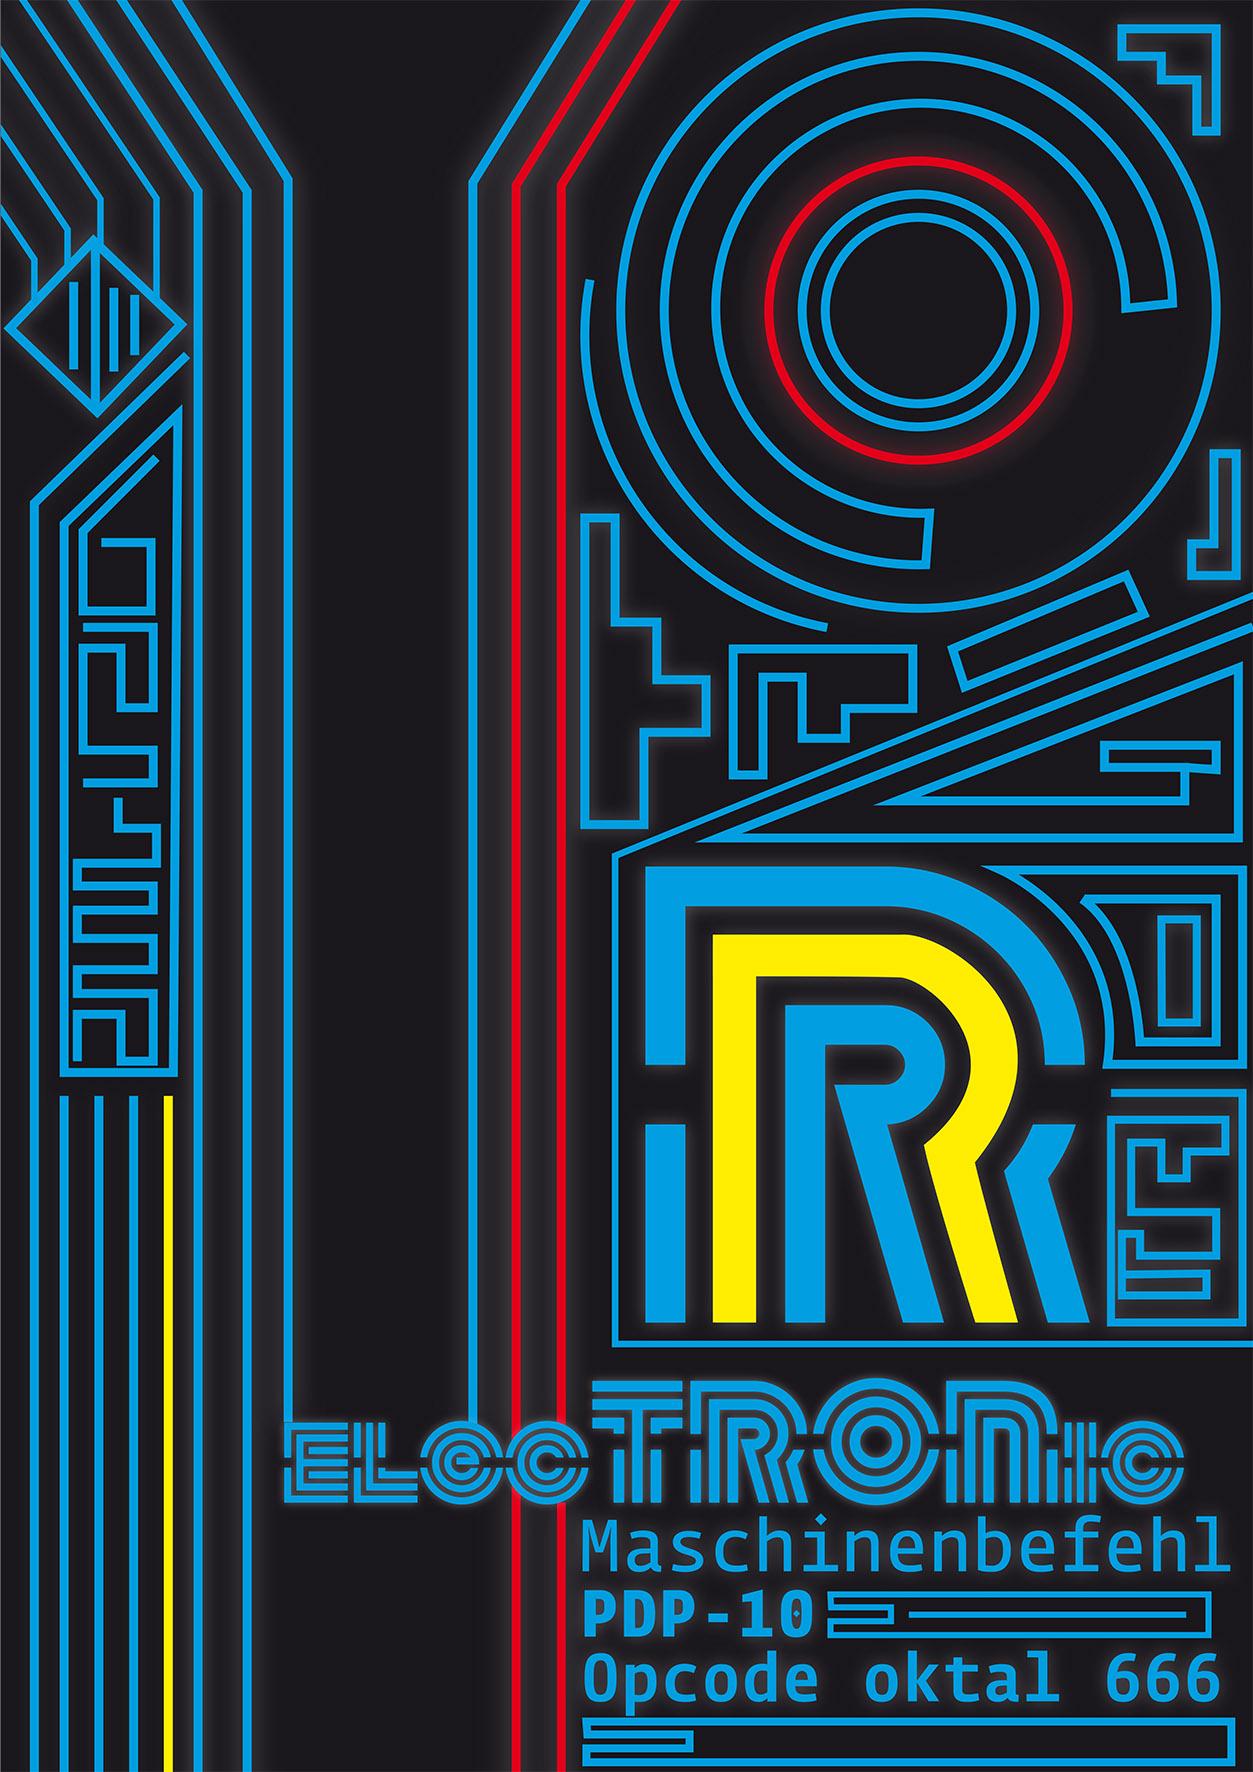 Annemarie-Tille-electronic